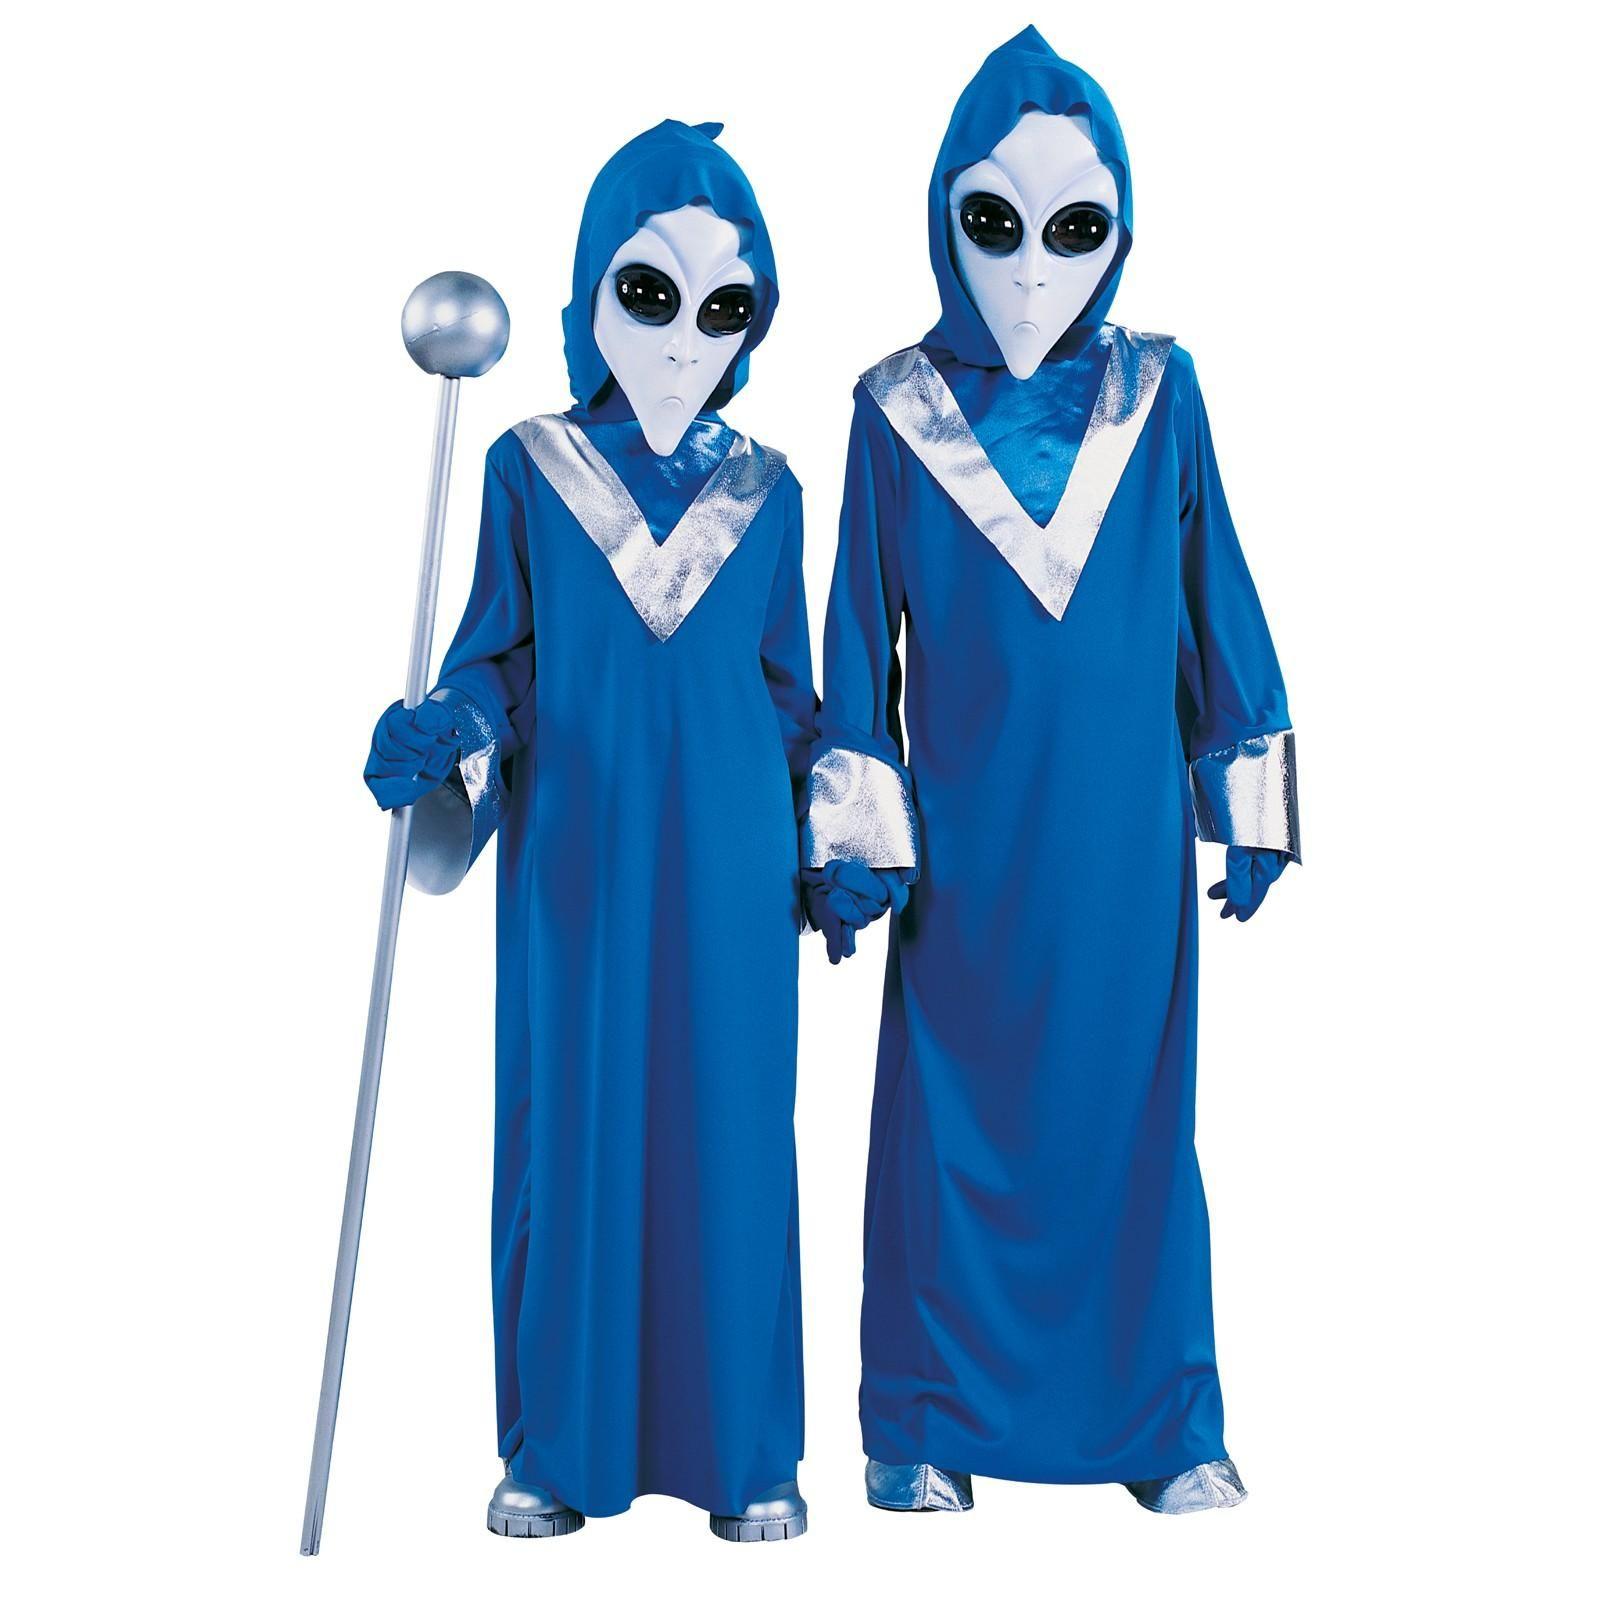 Kids Alien Costume Martian Outer Space Boys Girls Unisex Mask Robe Blue Silver